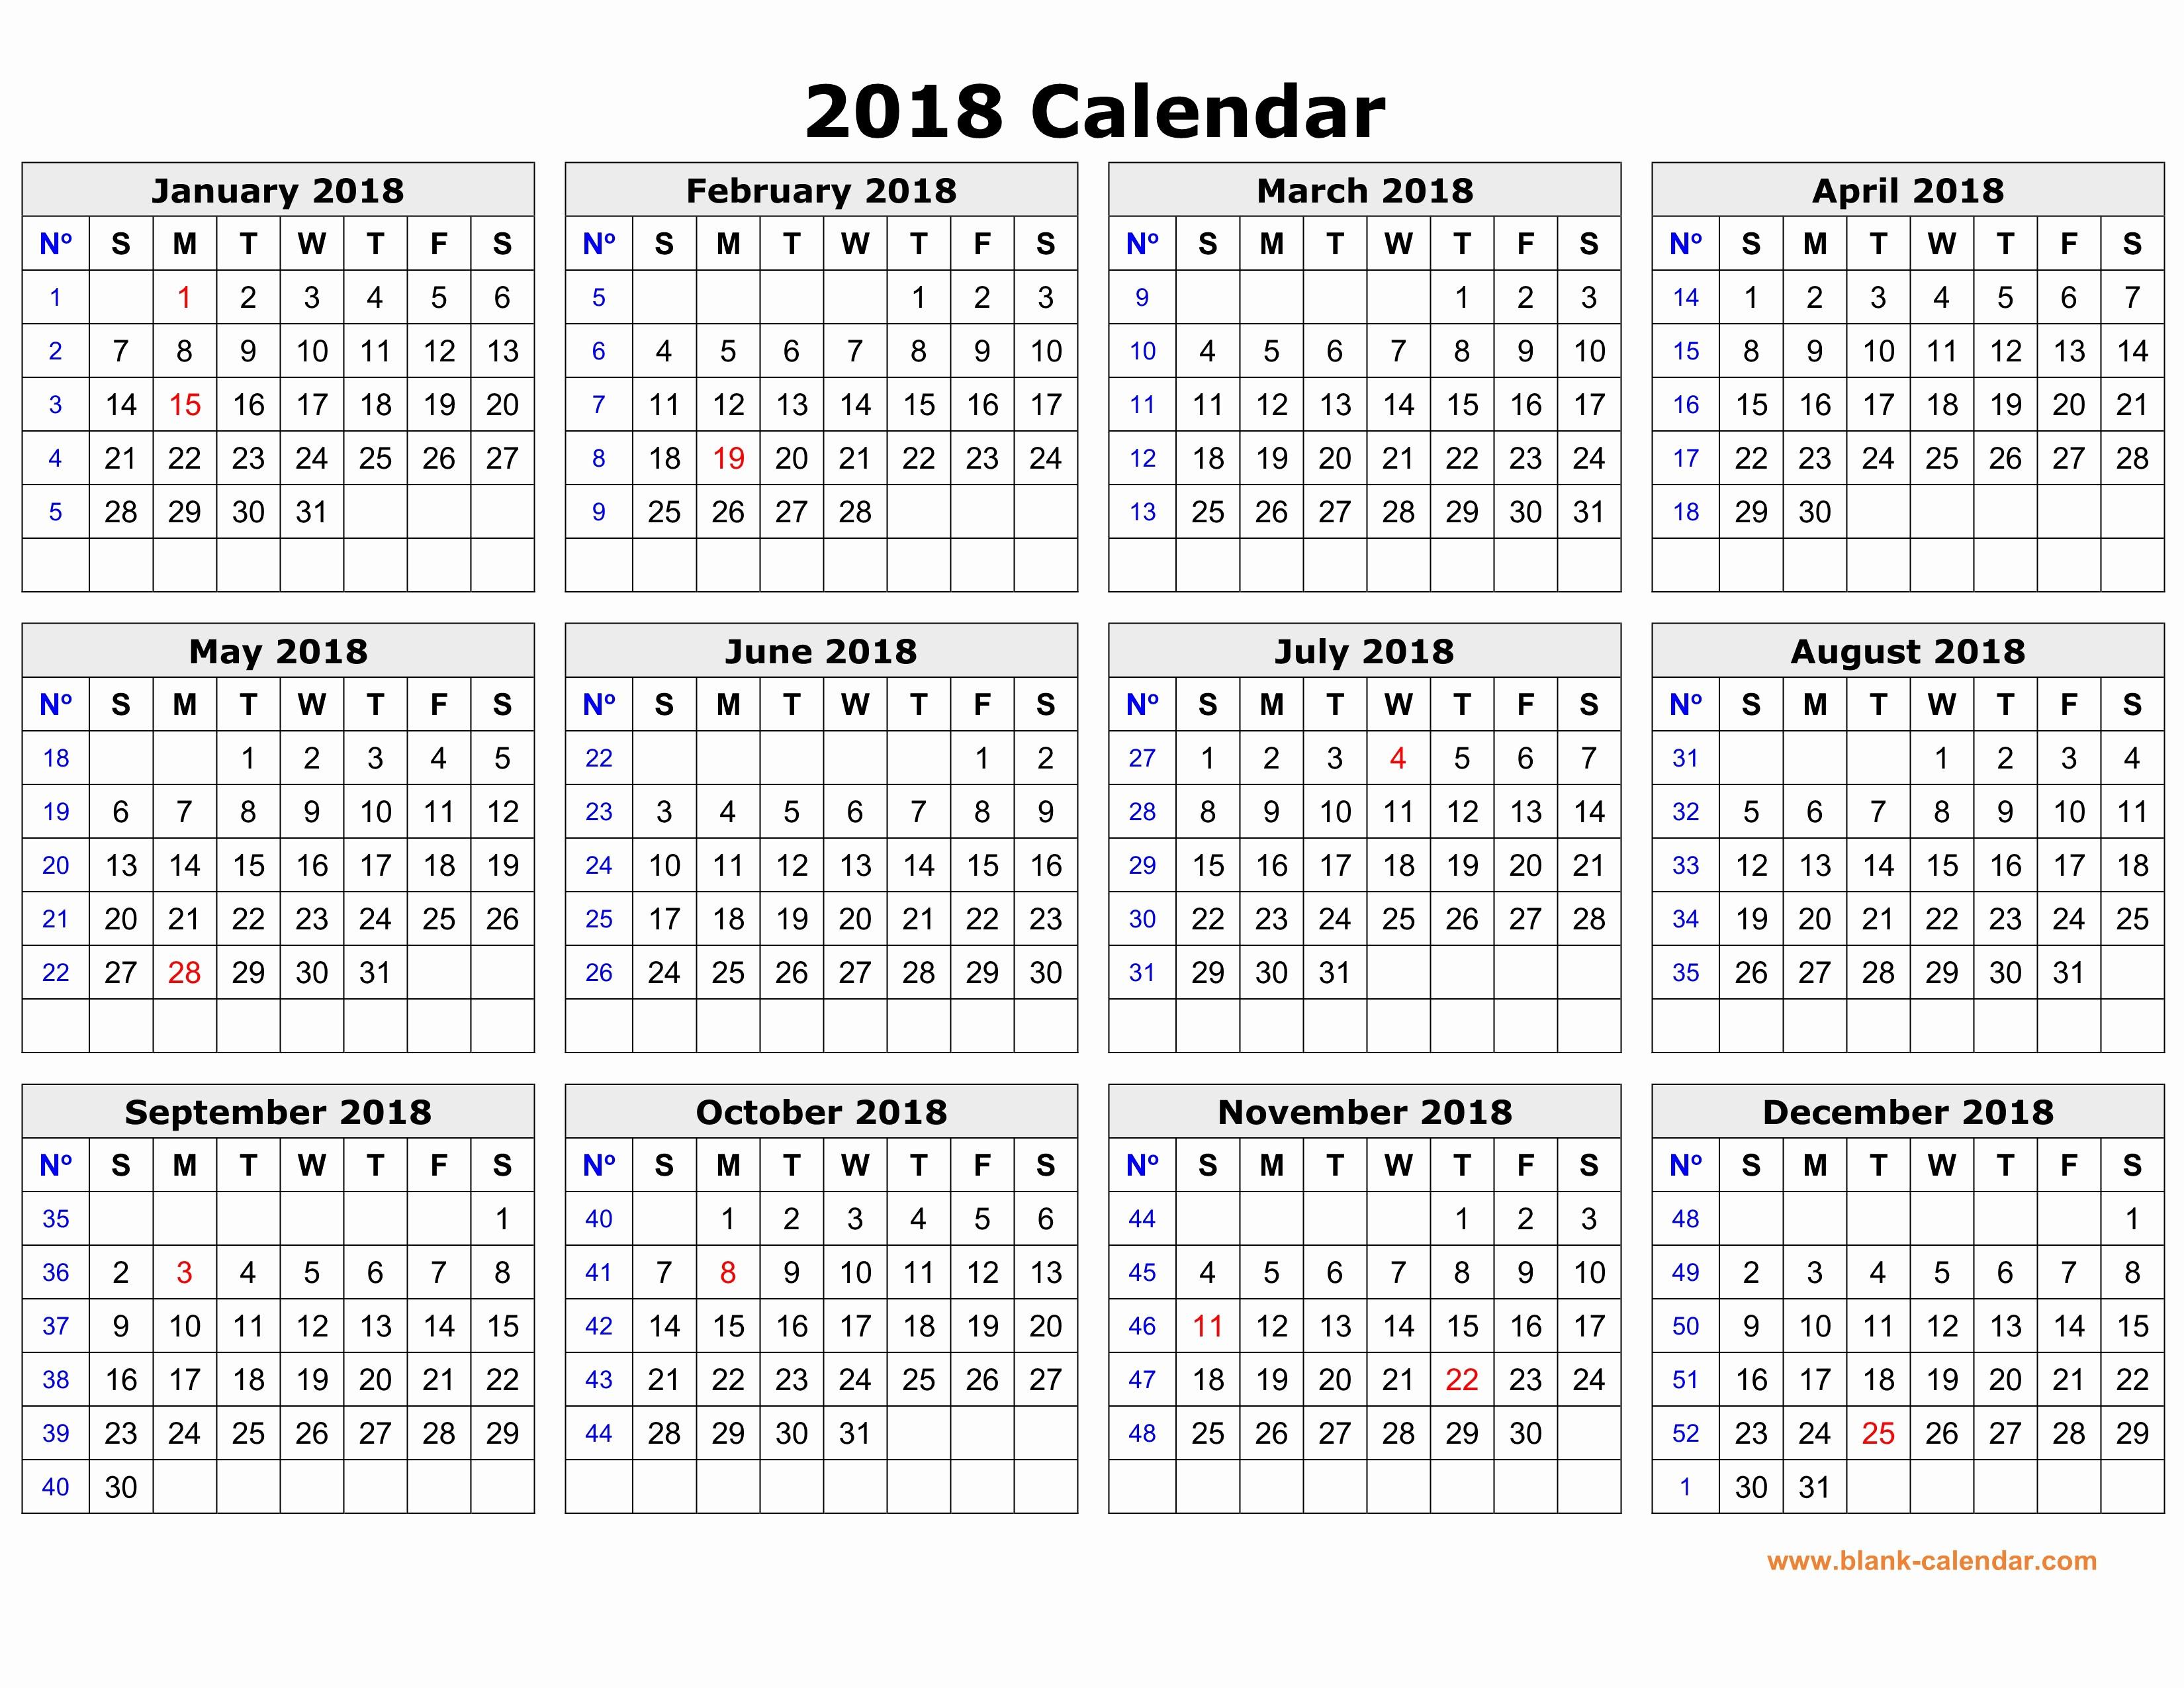 Free Printable Yearly Calendar 2018 Elegant Free Download Printable Calendar 2018 In One Page Clean